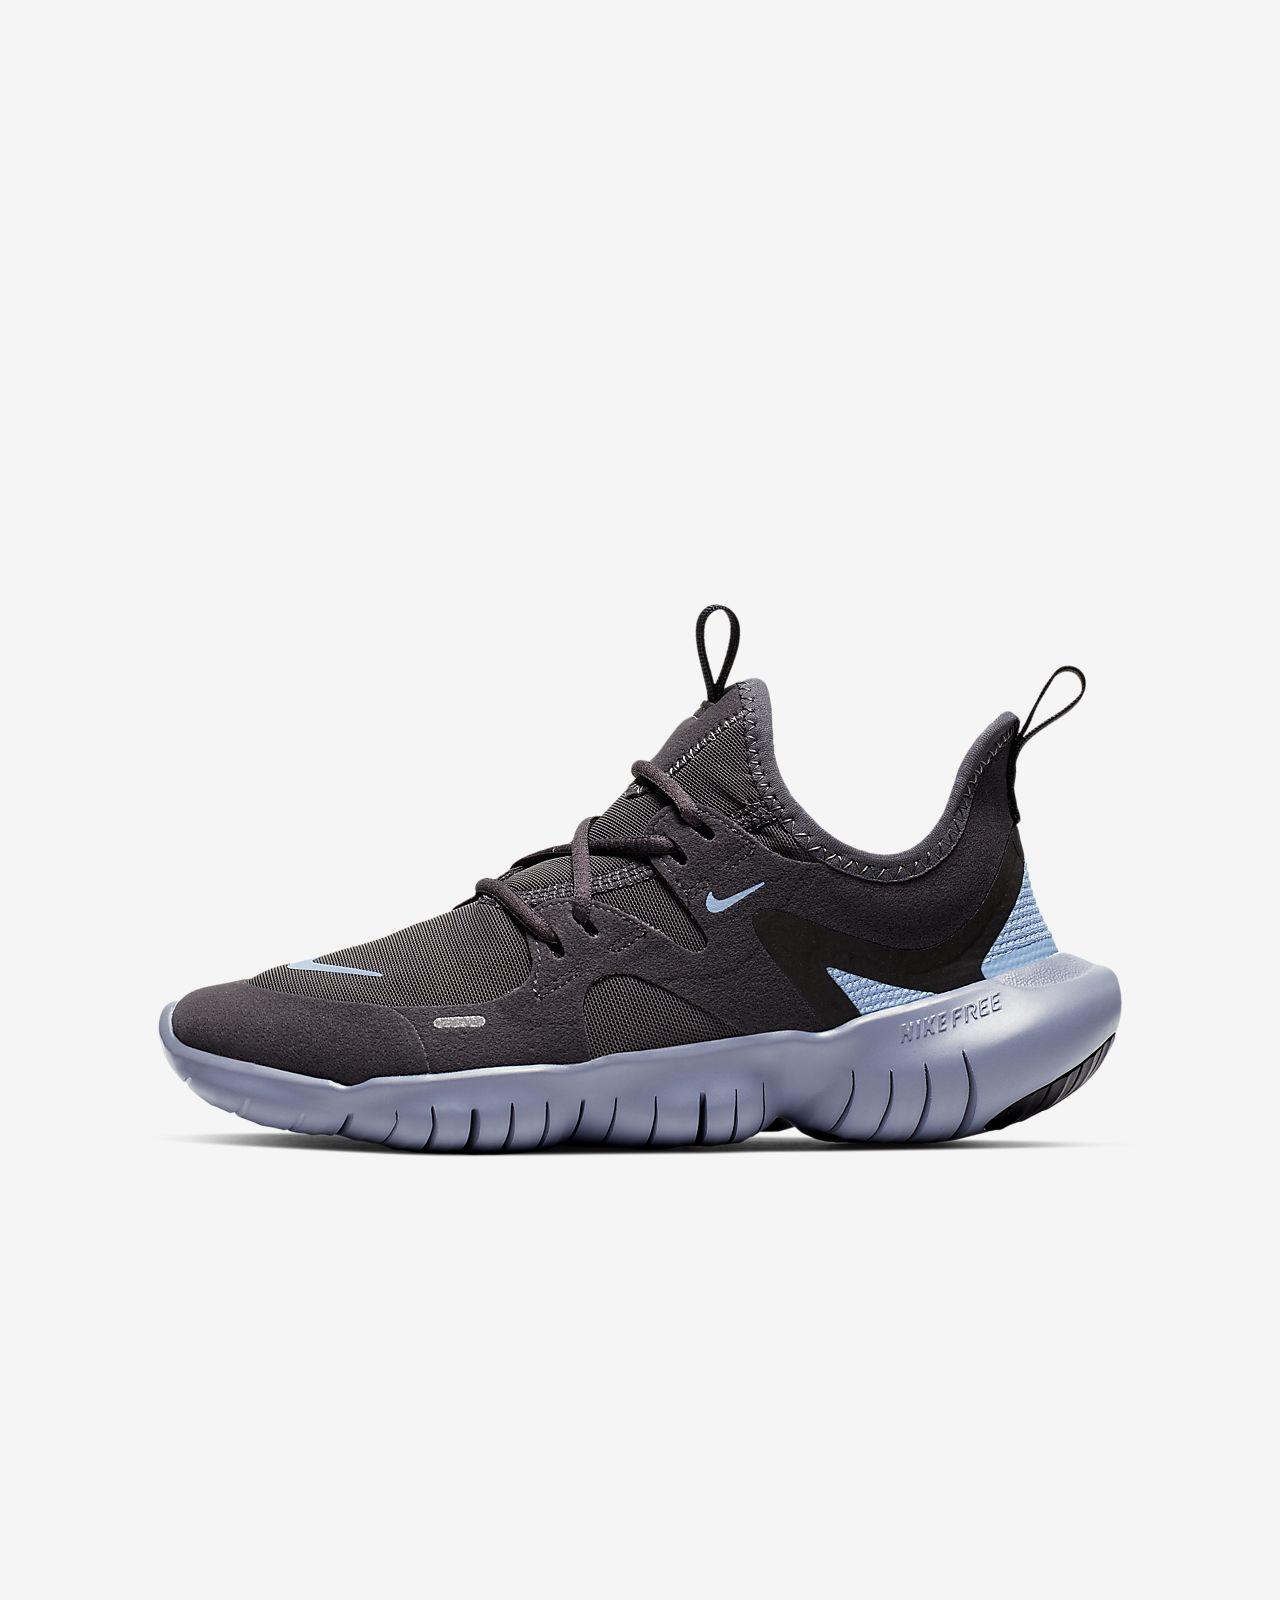 Löparsko Nike Free RN 5.0 för ungdom